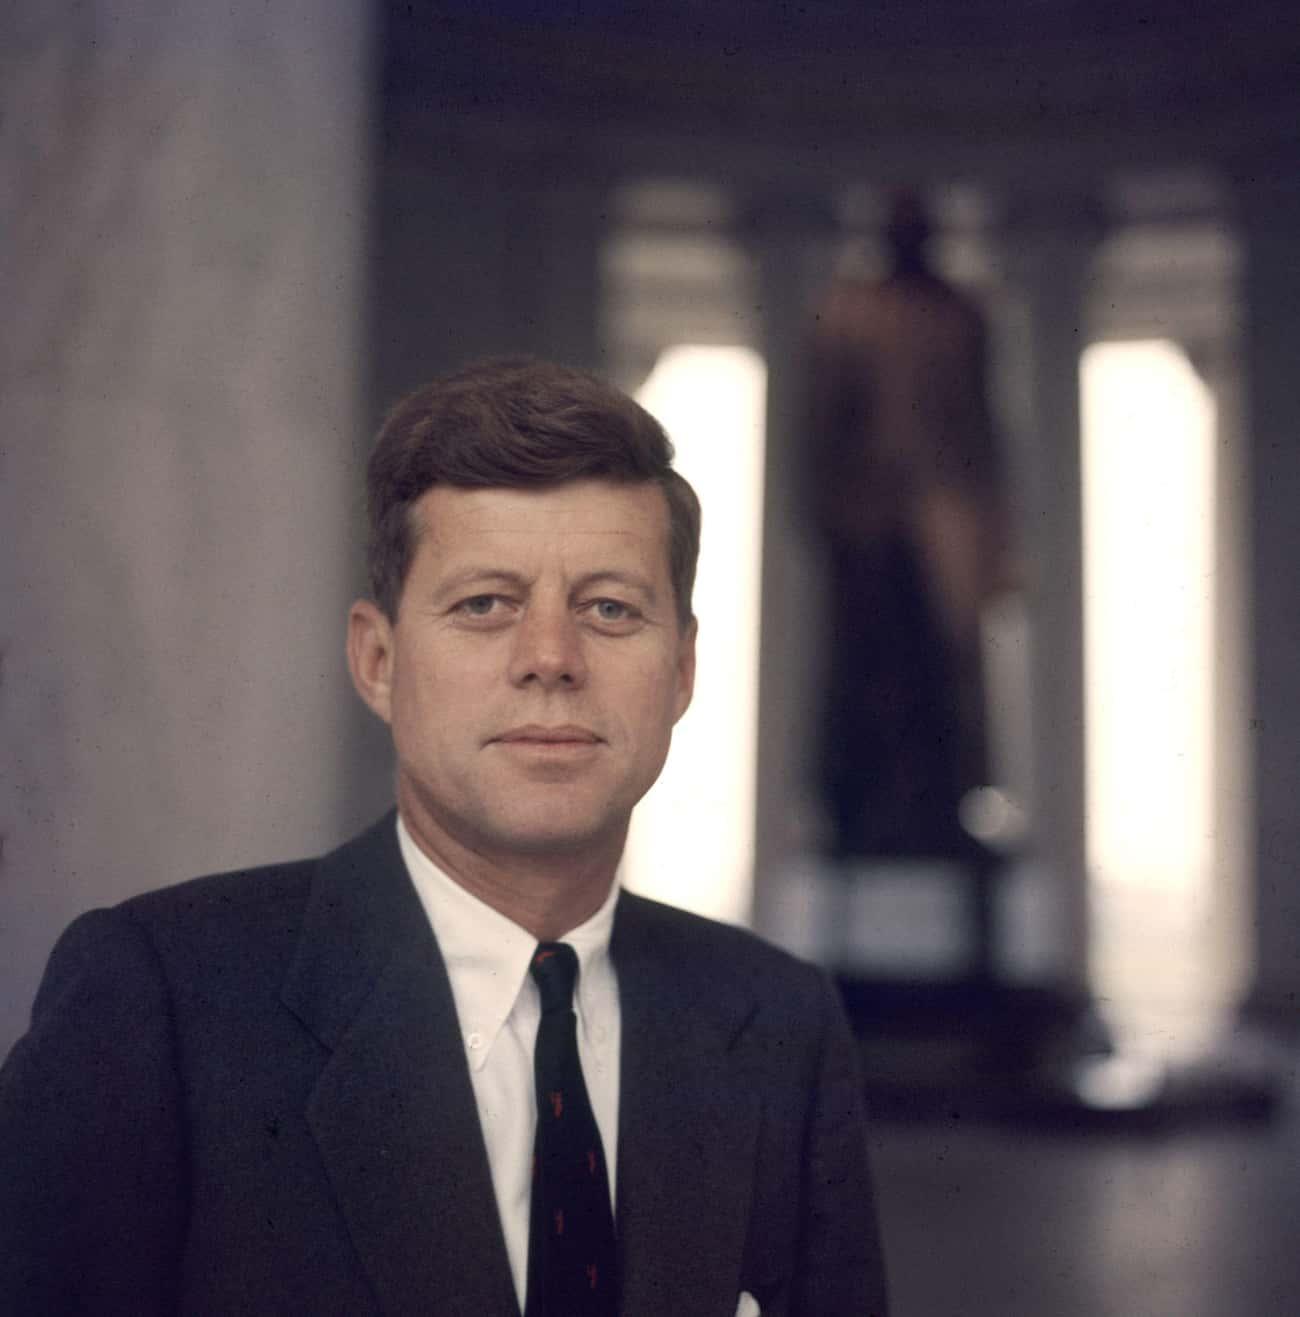 Joseph, John, and Caroline Kennedy: Harvard University